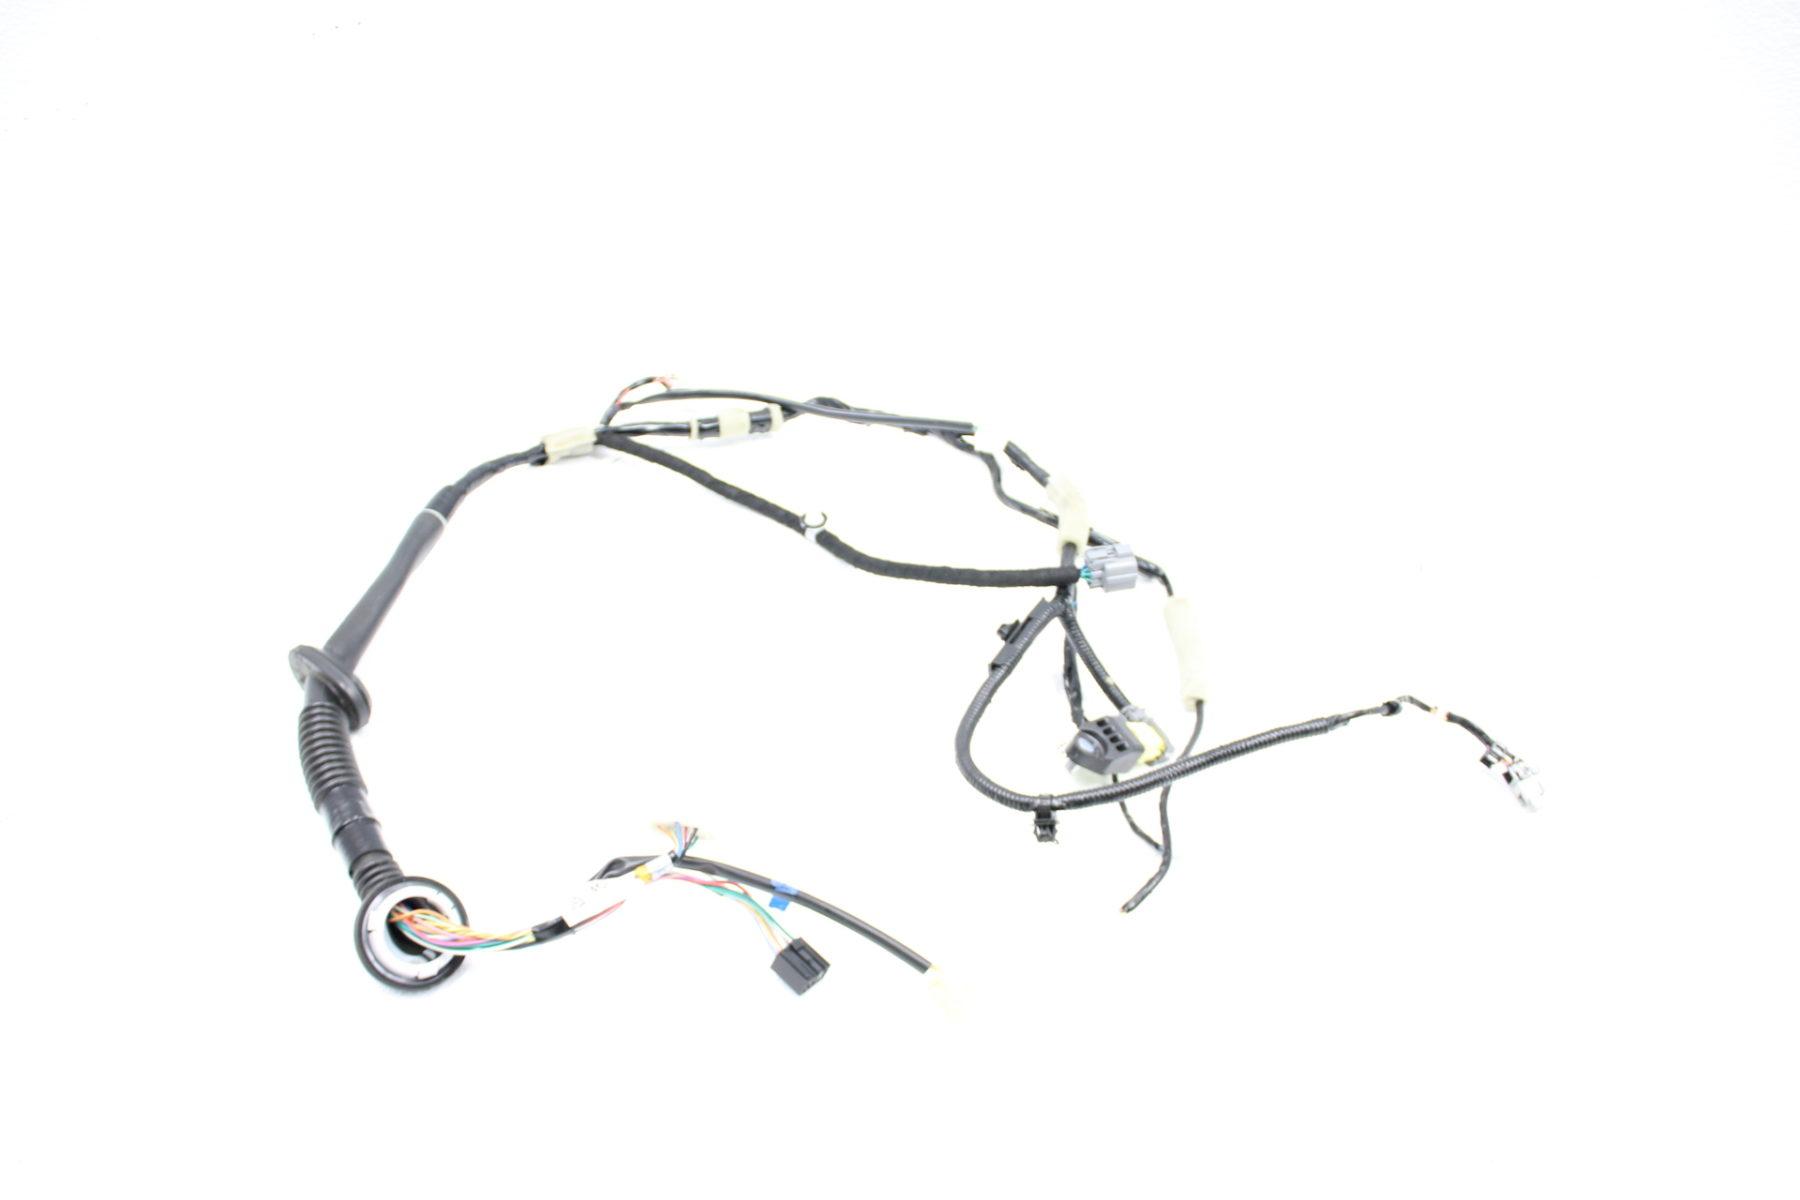 Subaru Wrx Amp Sti Right Front Door Harness